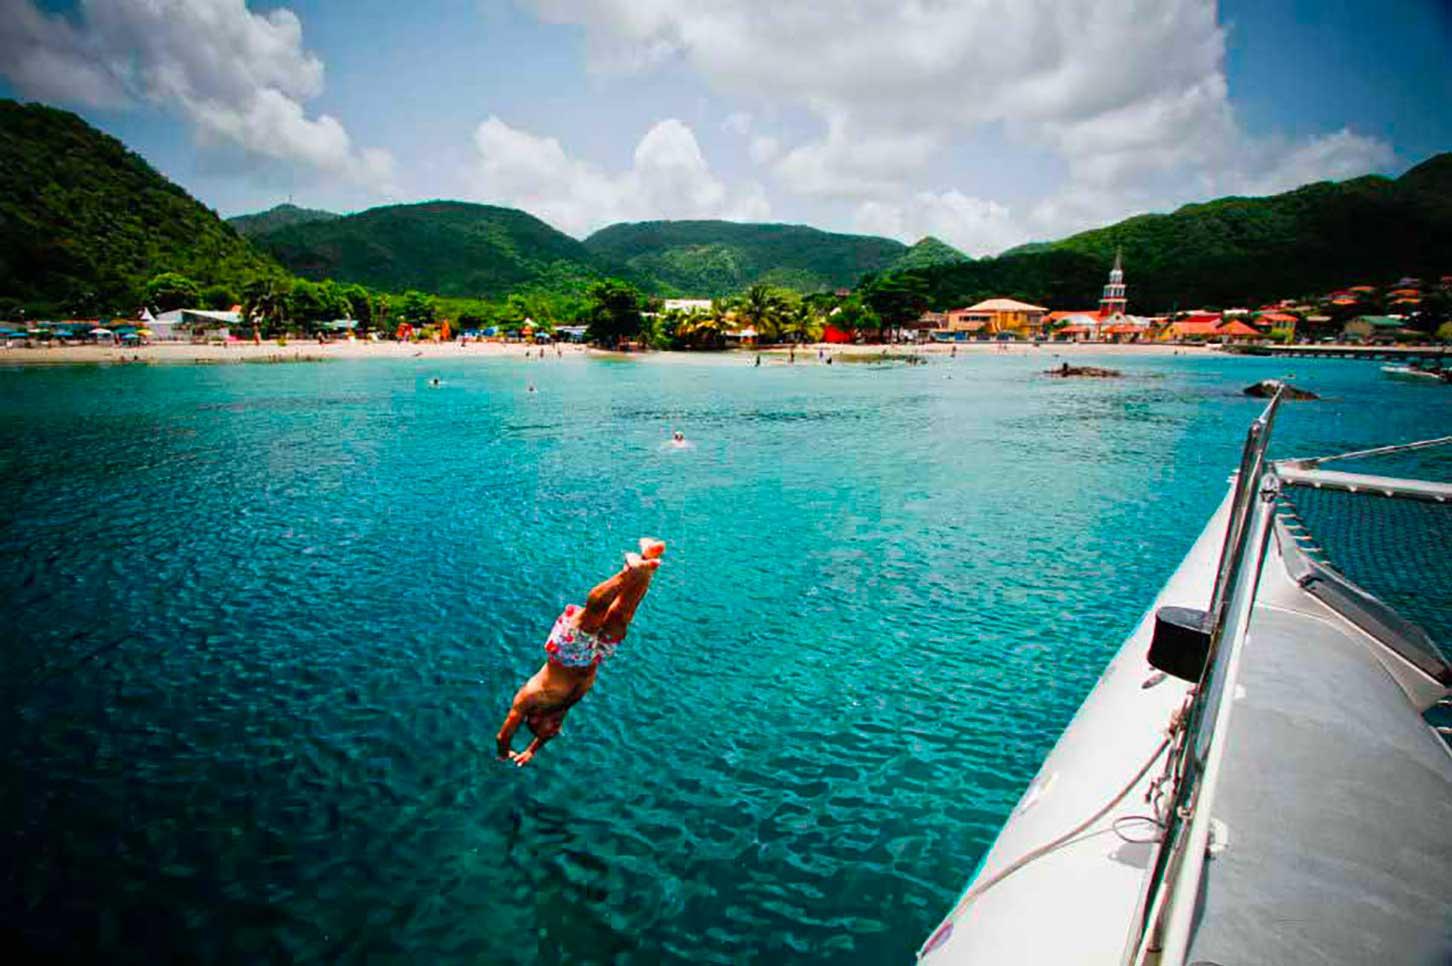 the Creole cata - rent catamaran Martinique cruising outing